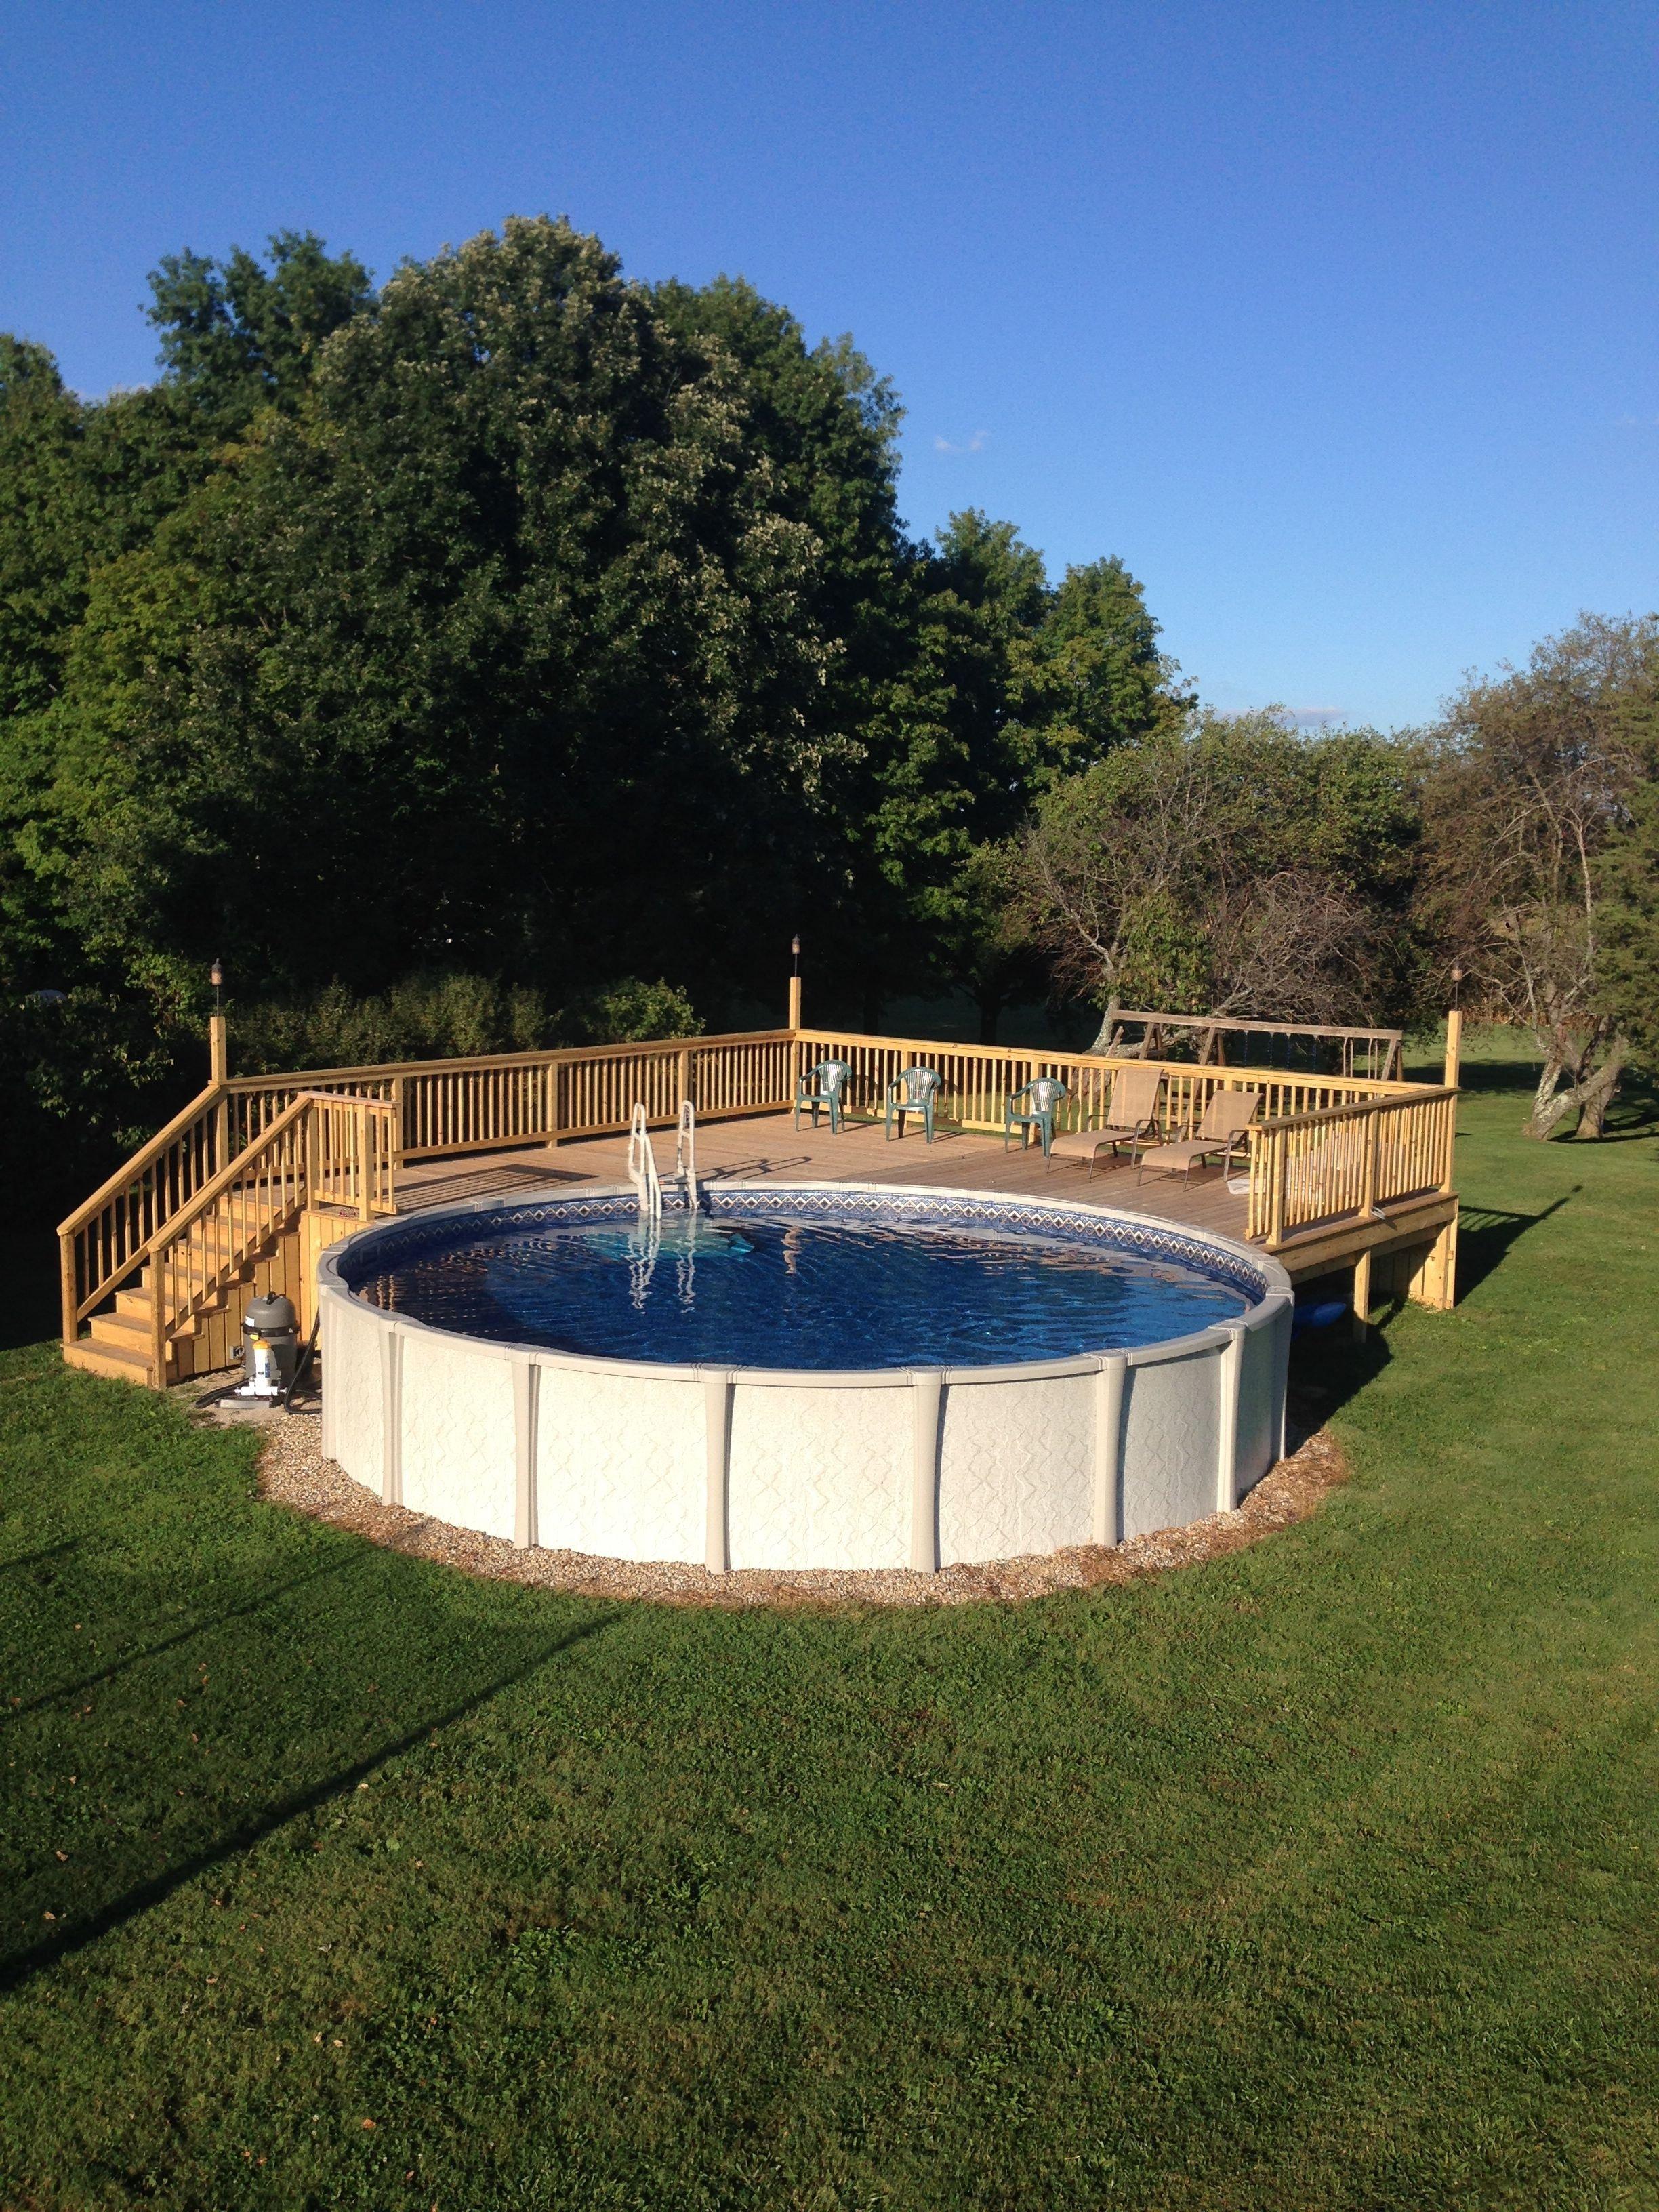 10 Unique In Ground Pool Deck Ideas above ground pool deck for 24 ft round pool deck is 28x28 pool 2020